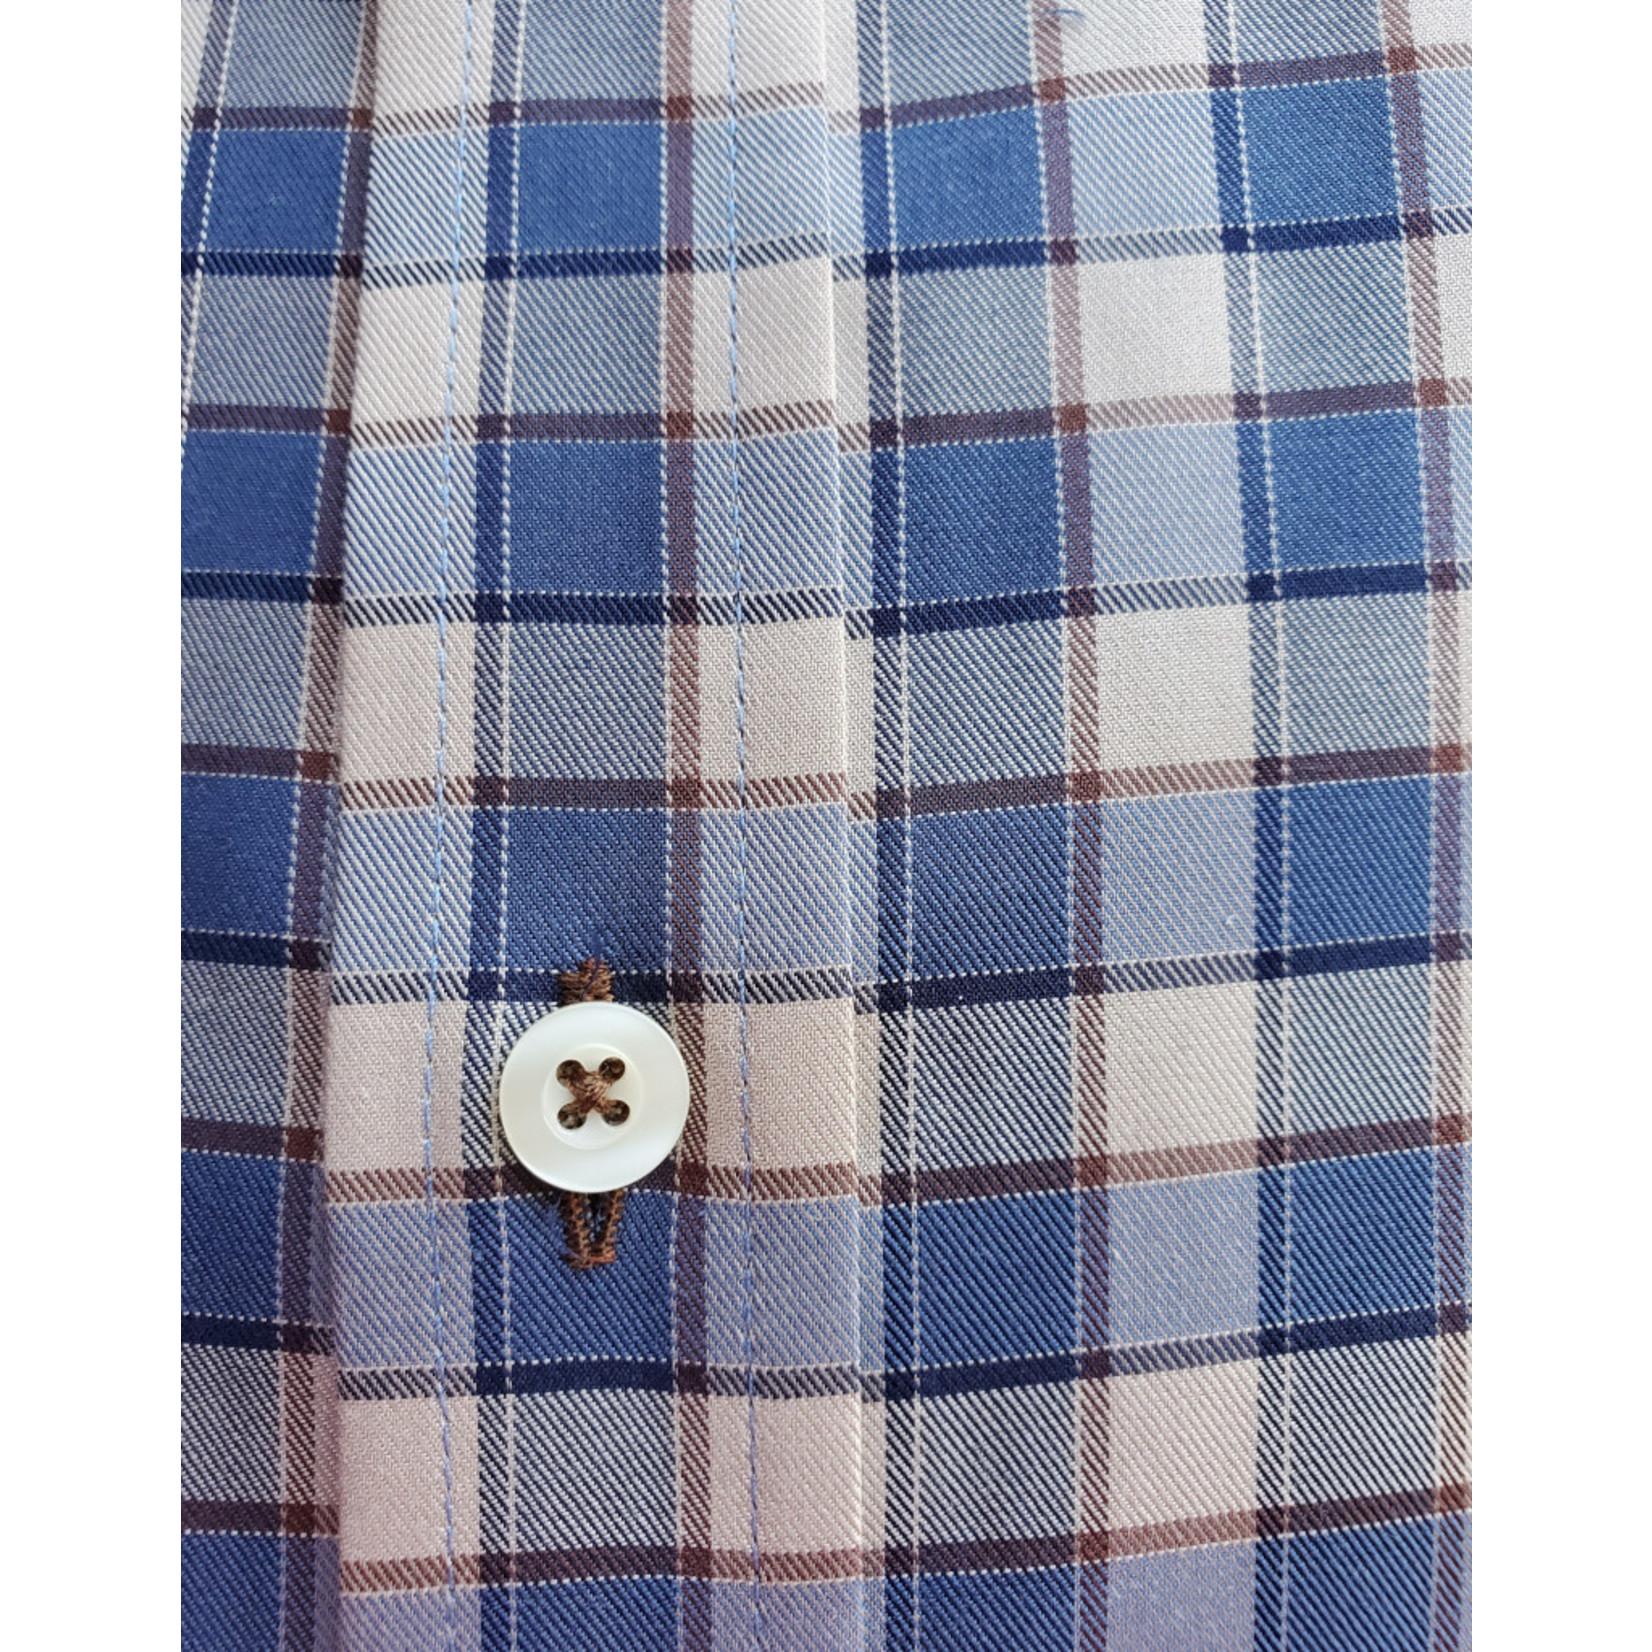 Forsyth Forsyth Long Sleeve Button Down - Denim Twill Check